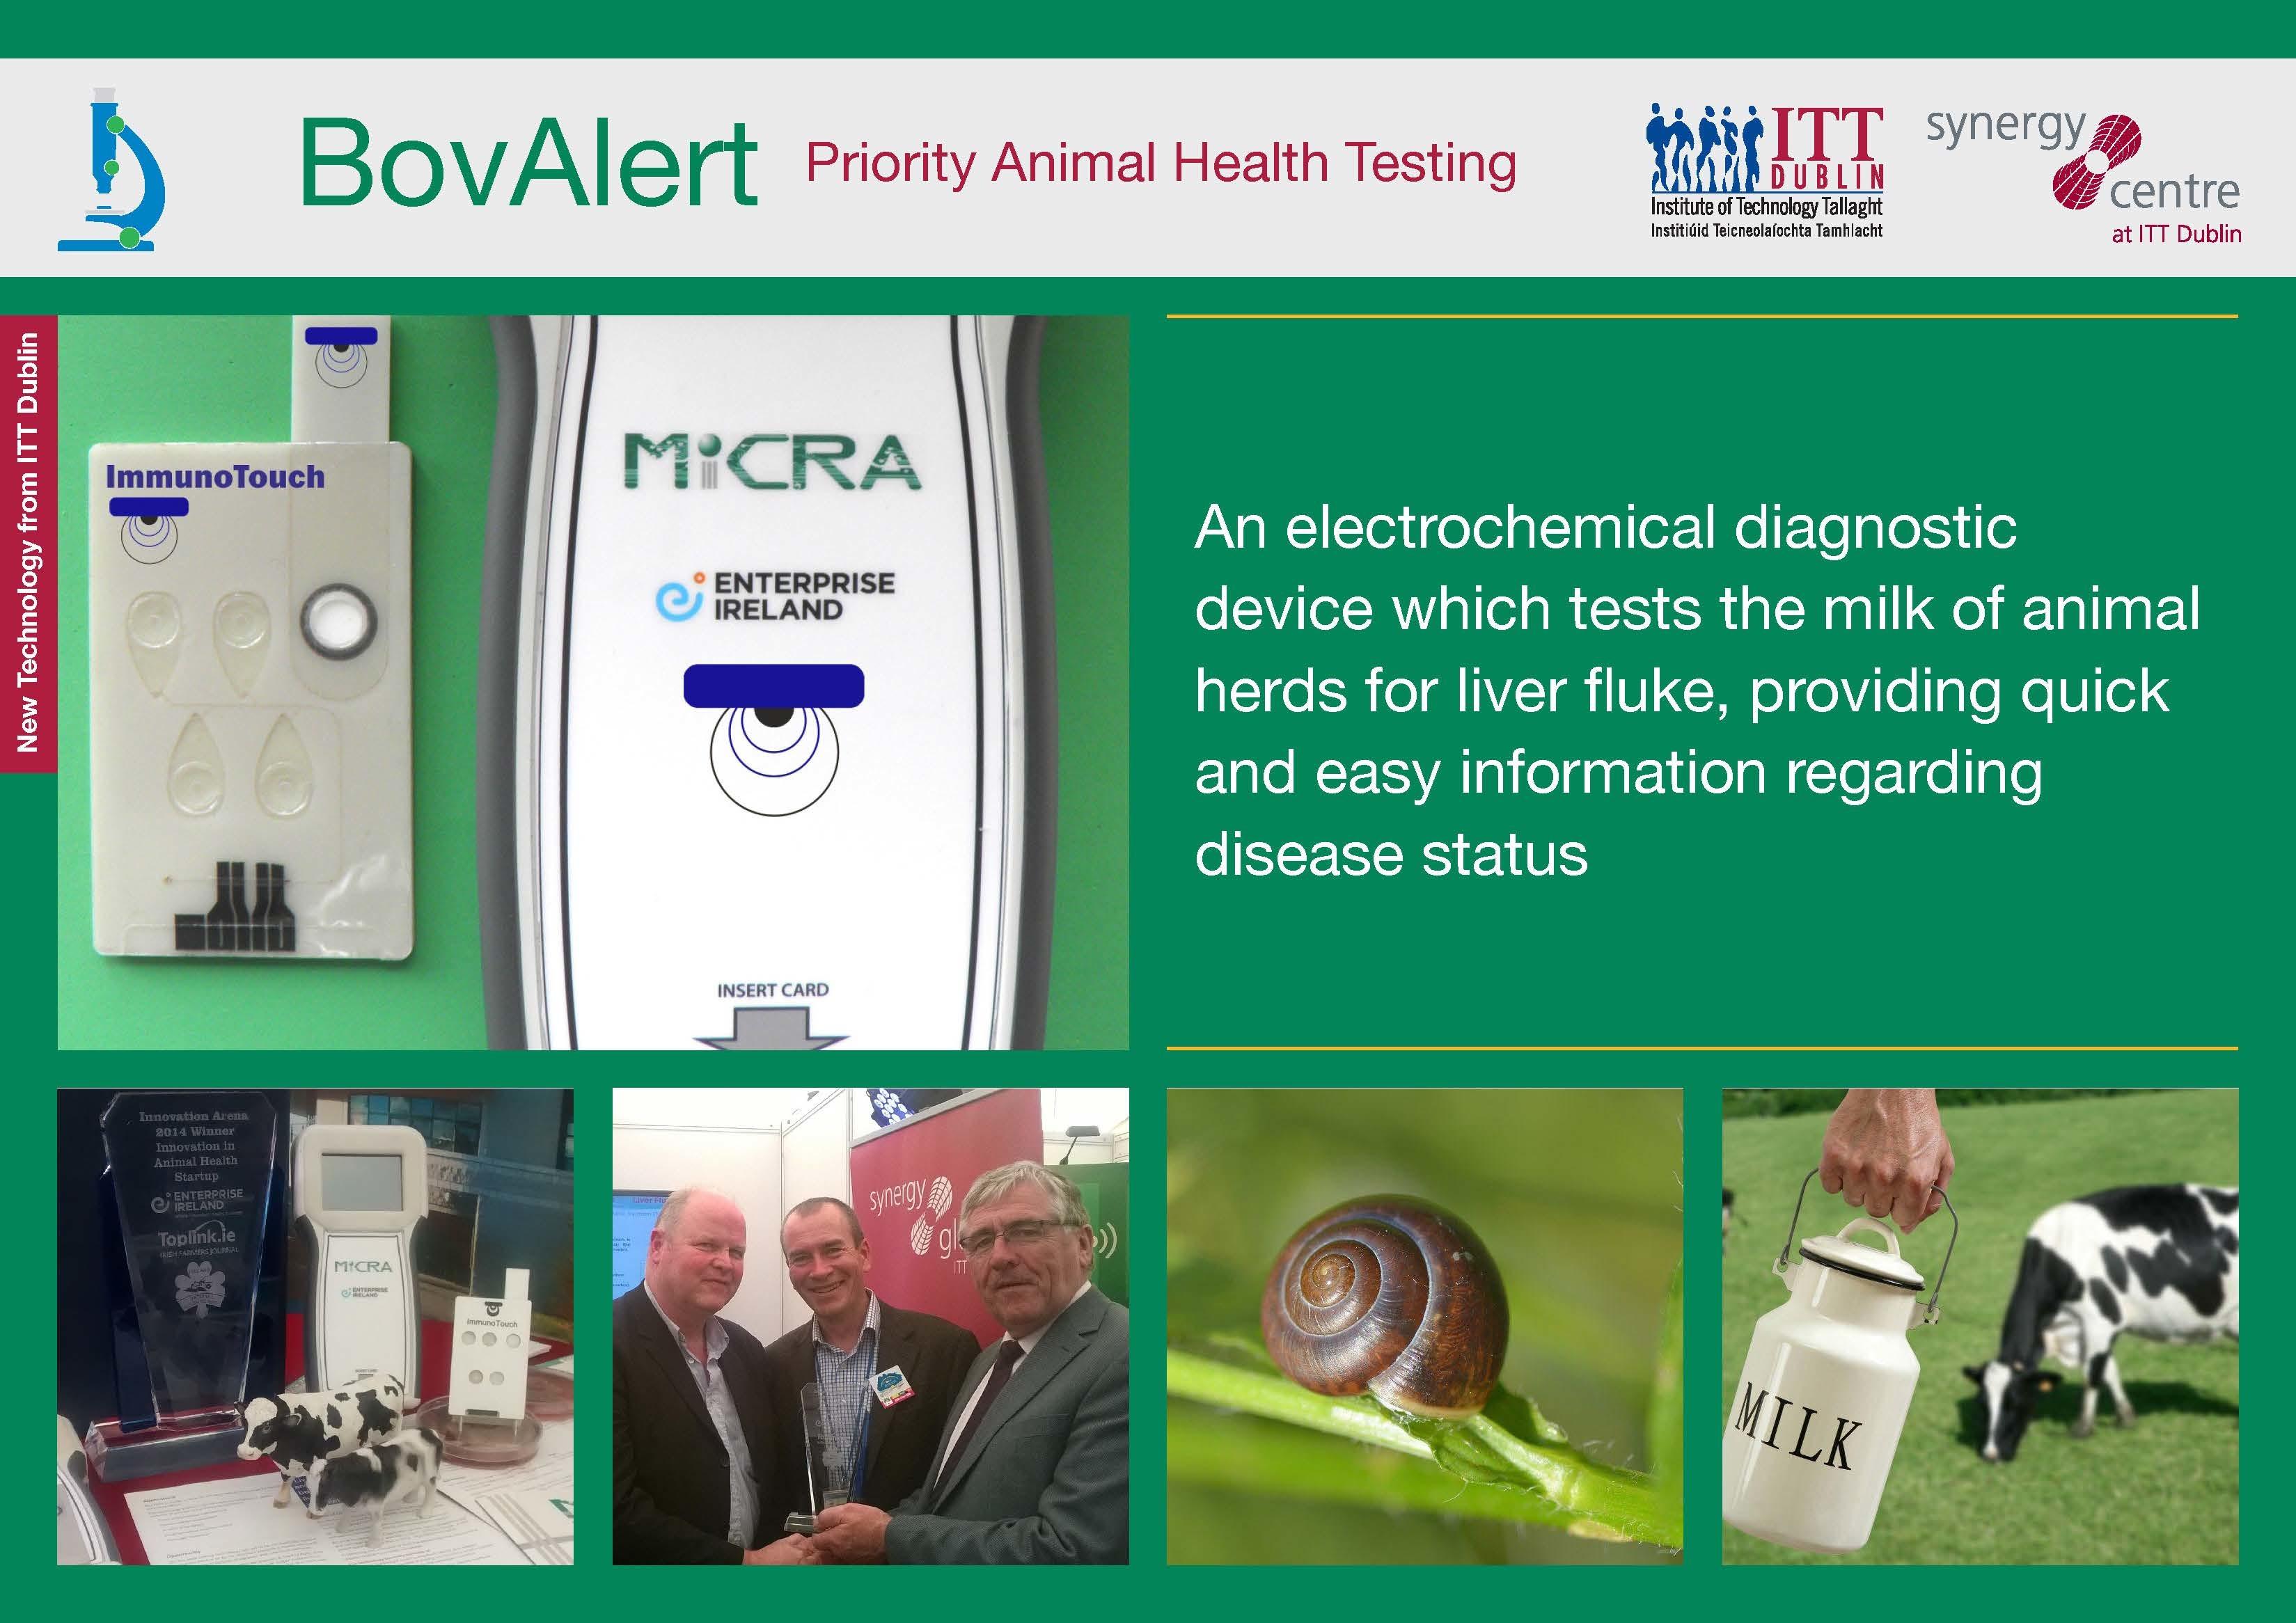 BovAlert: Priority Animal Health Testing